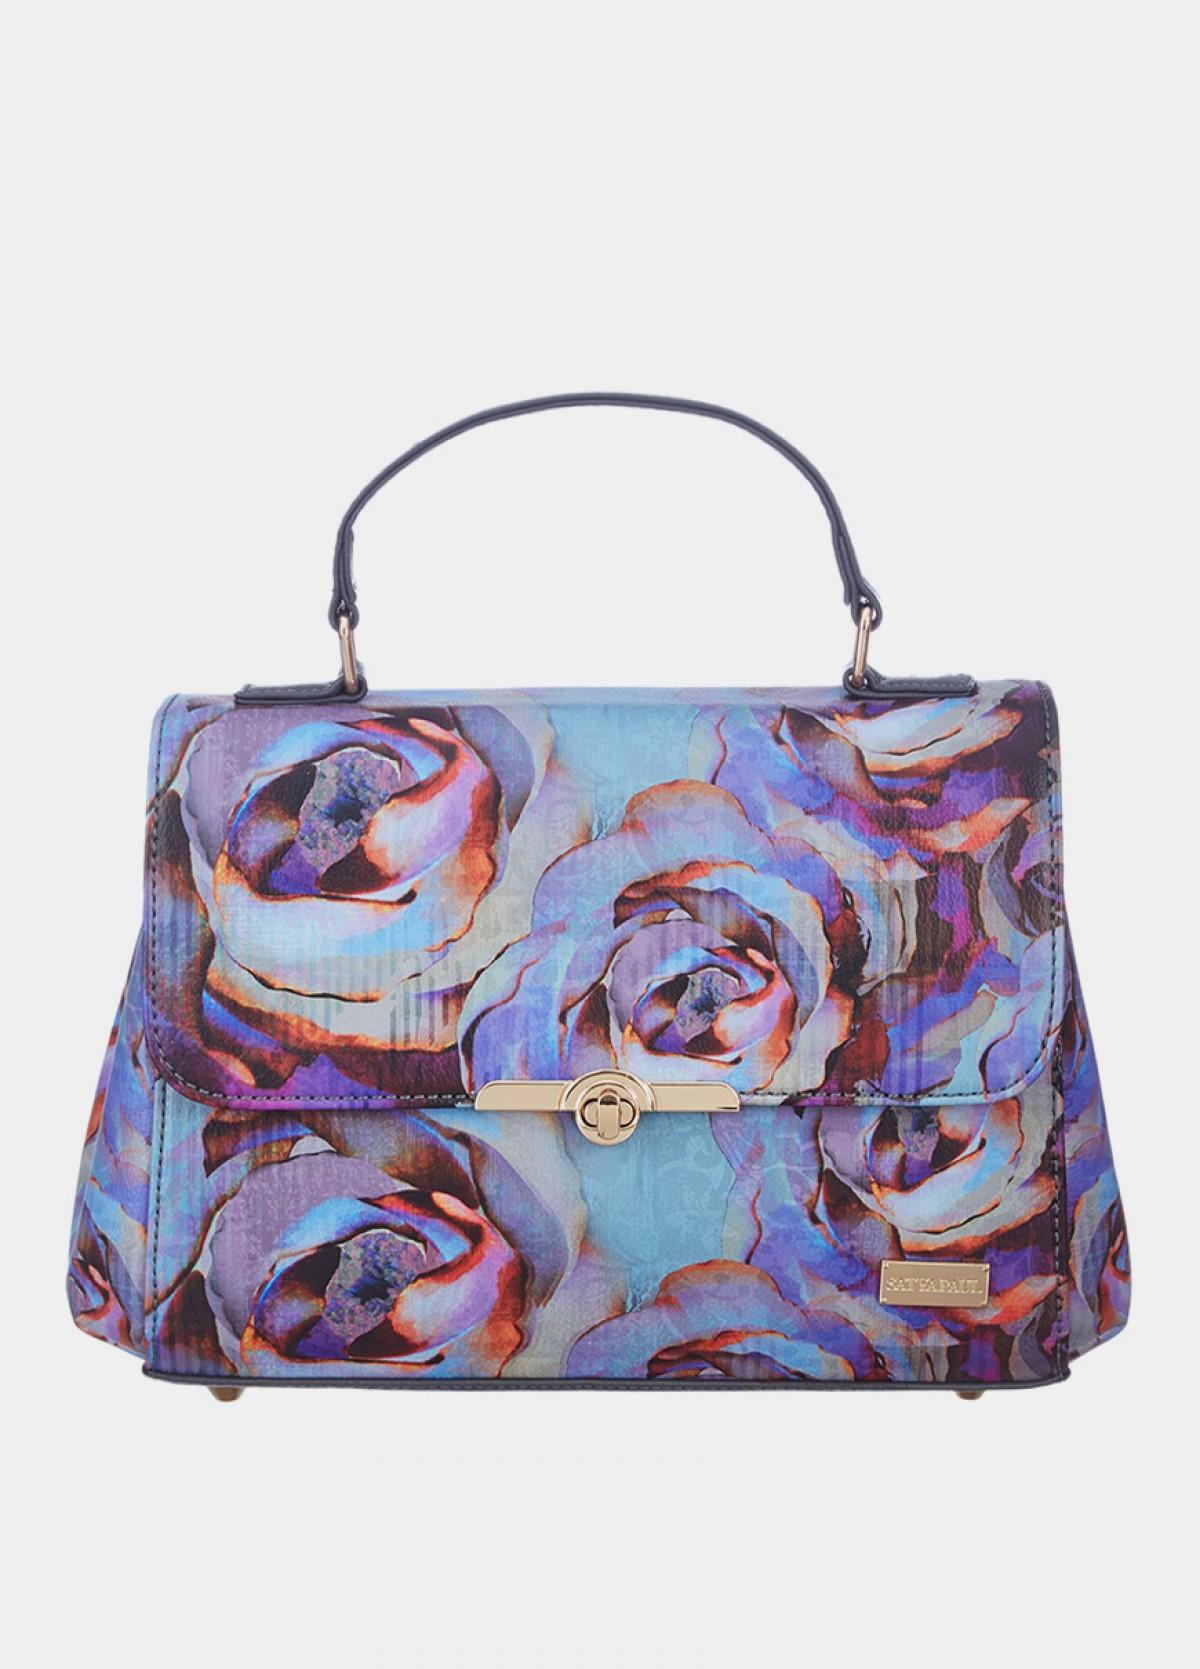 The Winter Florals Satchel Bag